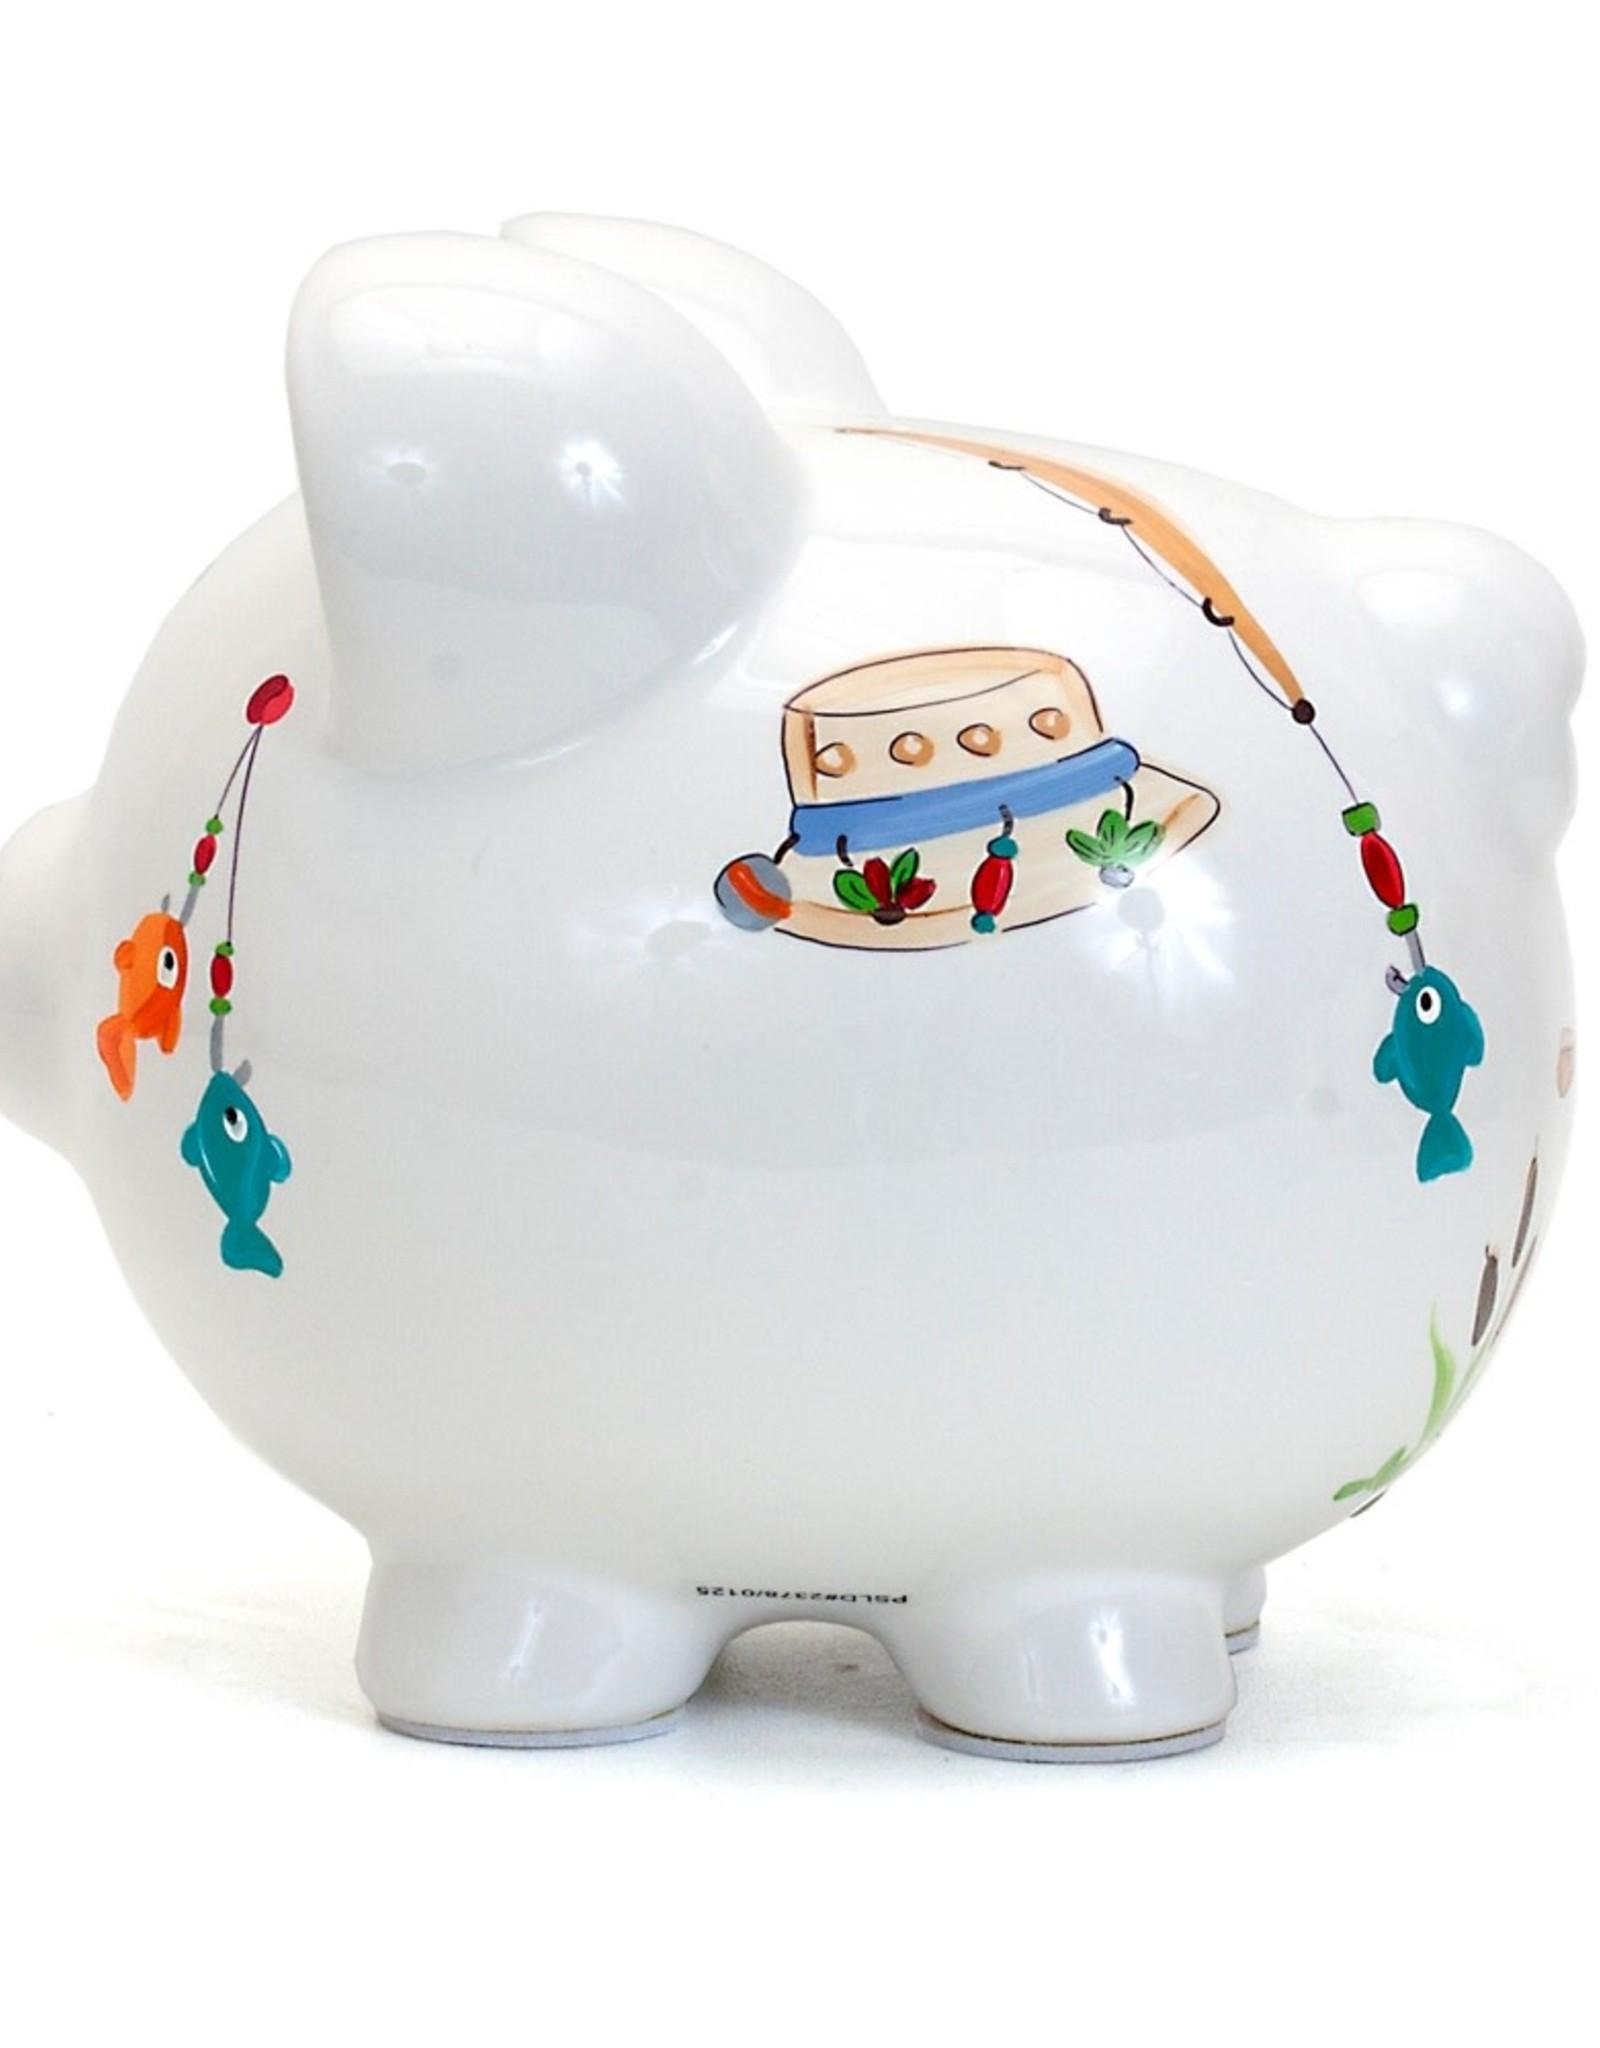 Child to Cherish Gone Fishing Pig Bank